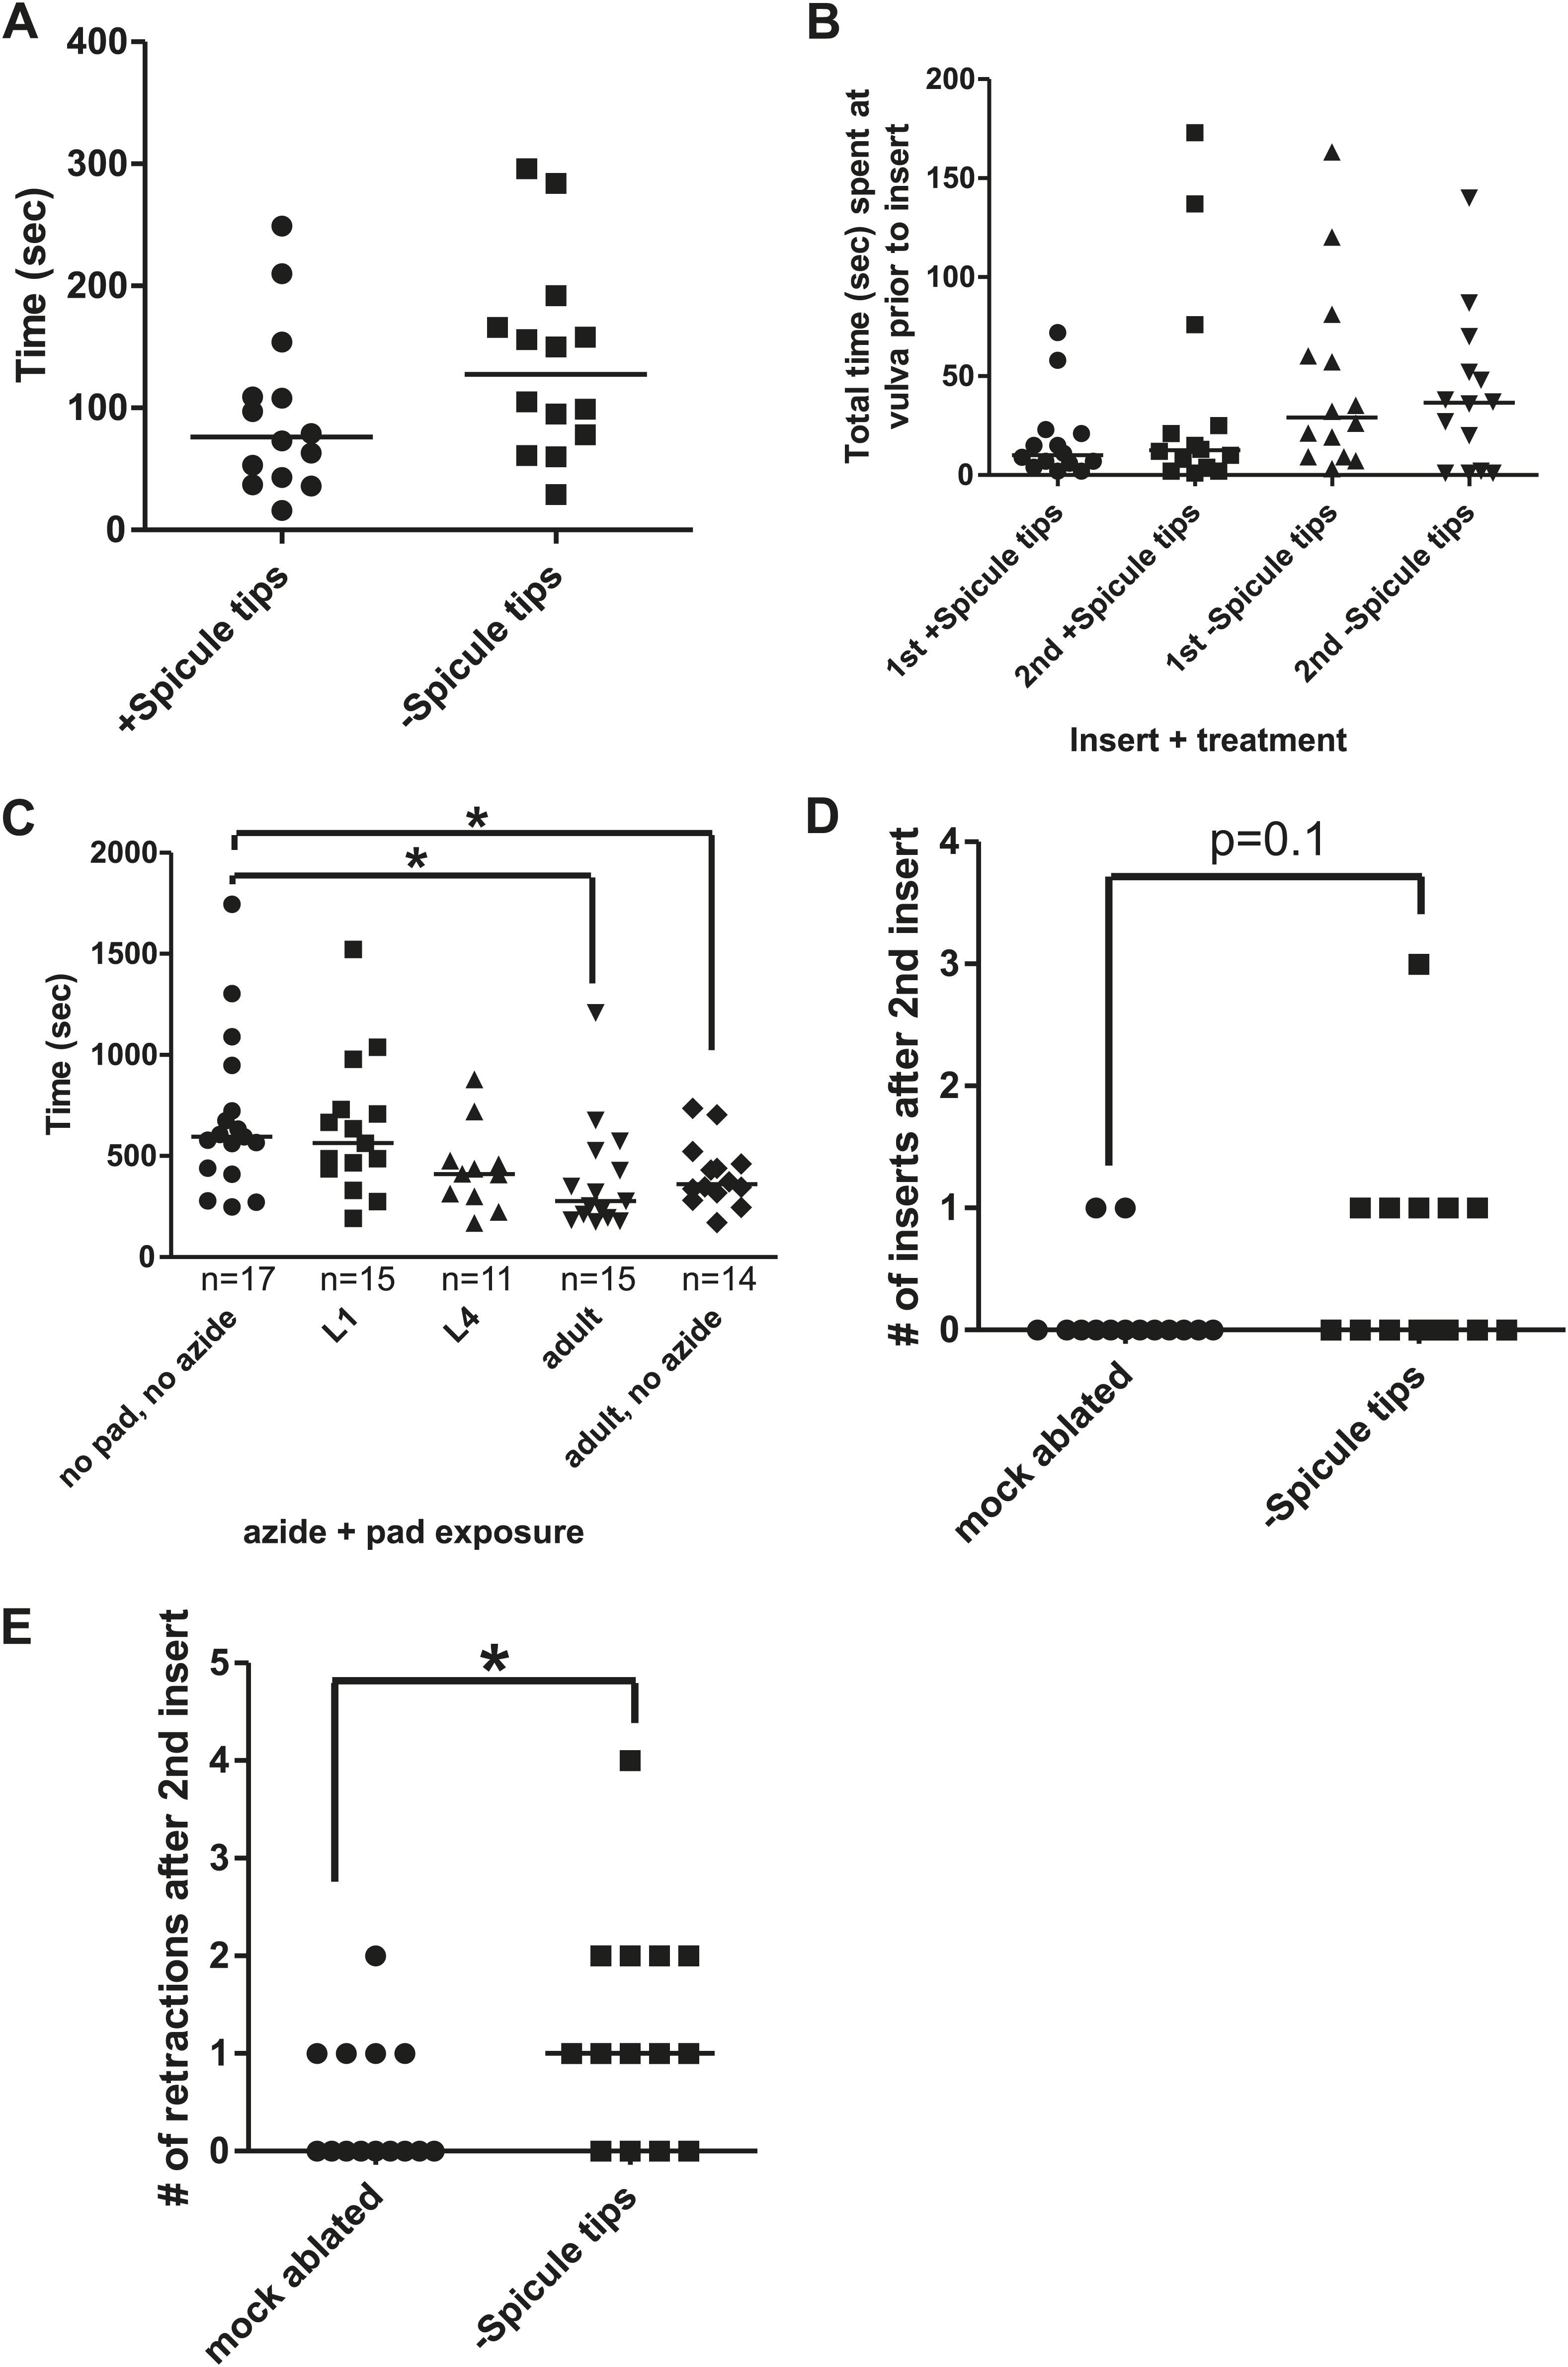 Caenorhabditis elegans male sensory-motor neurons and